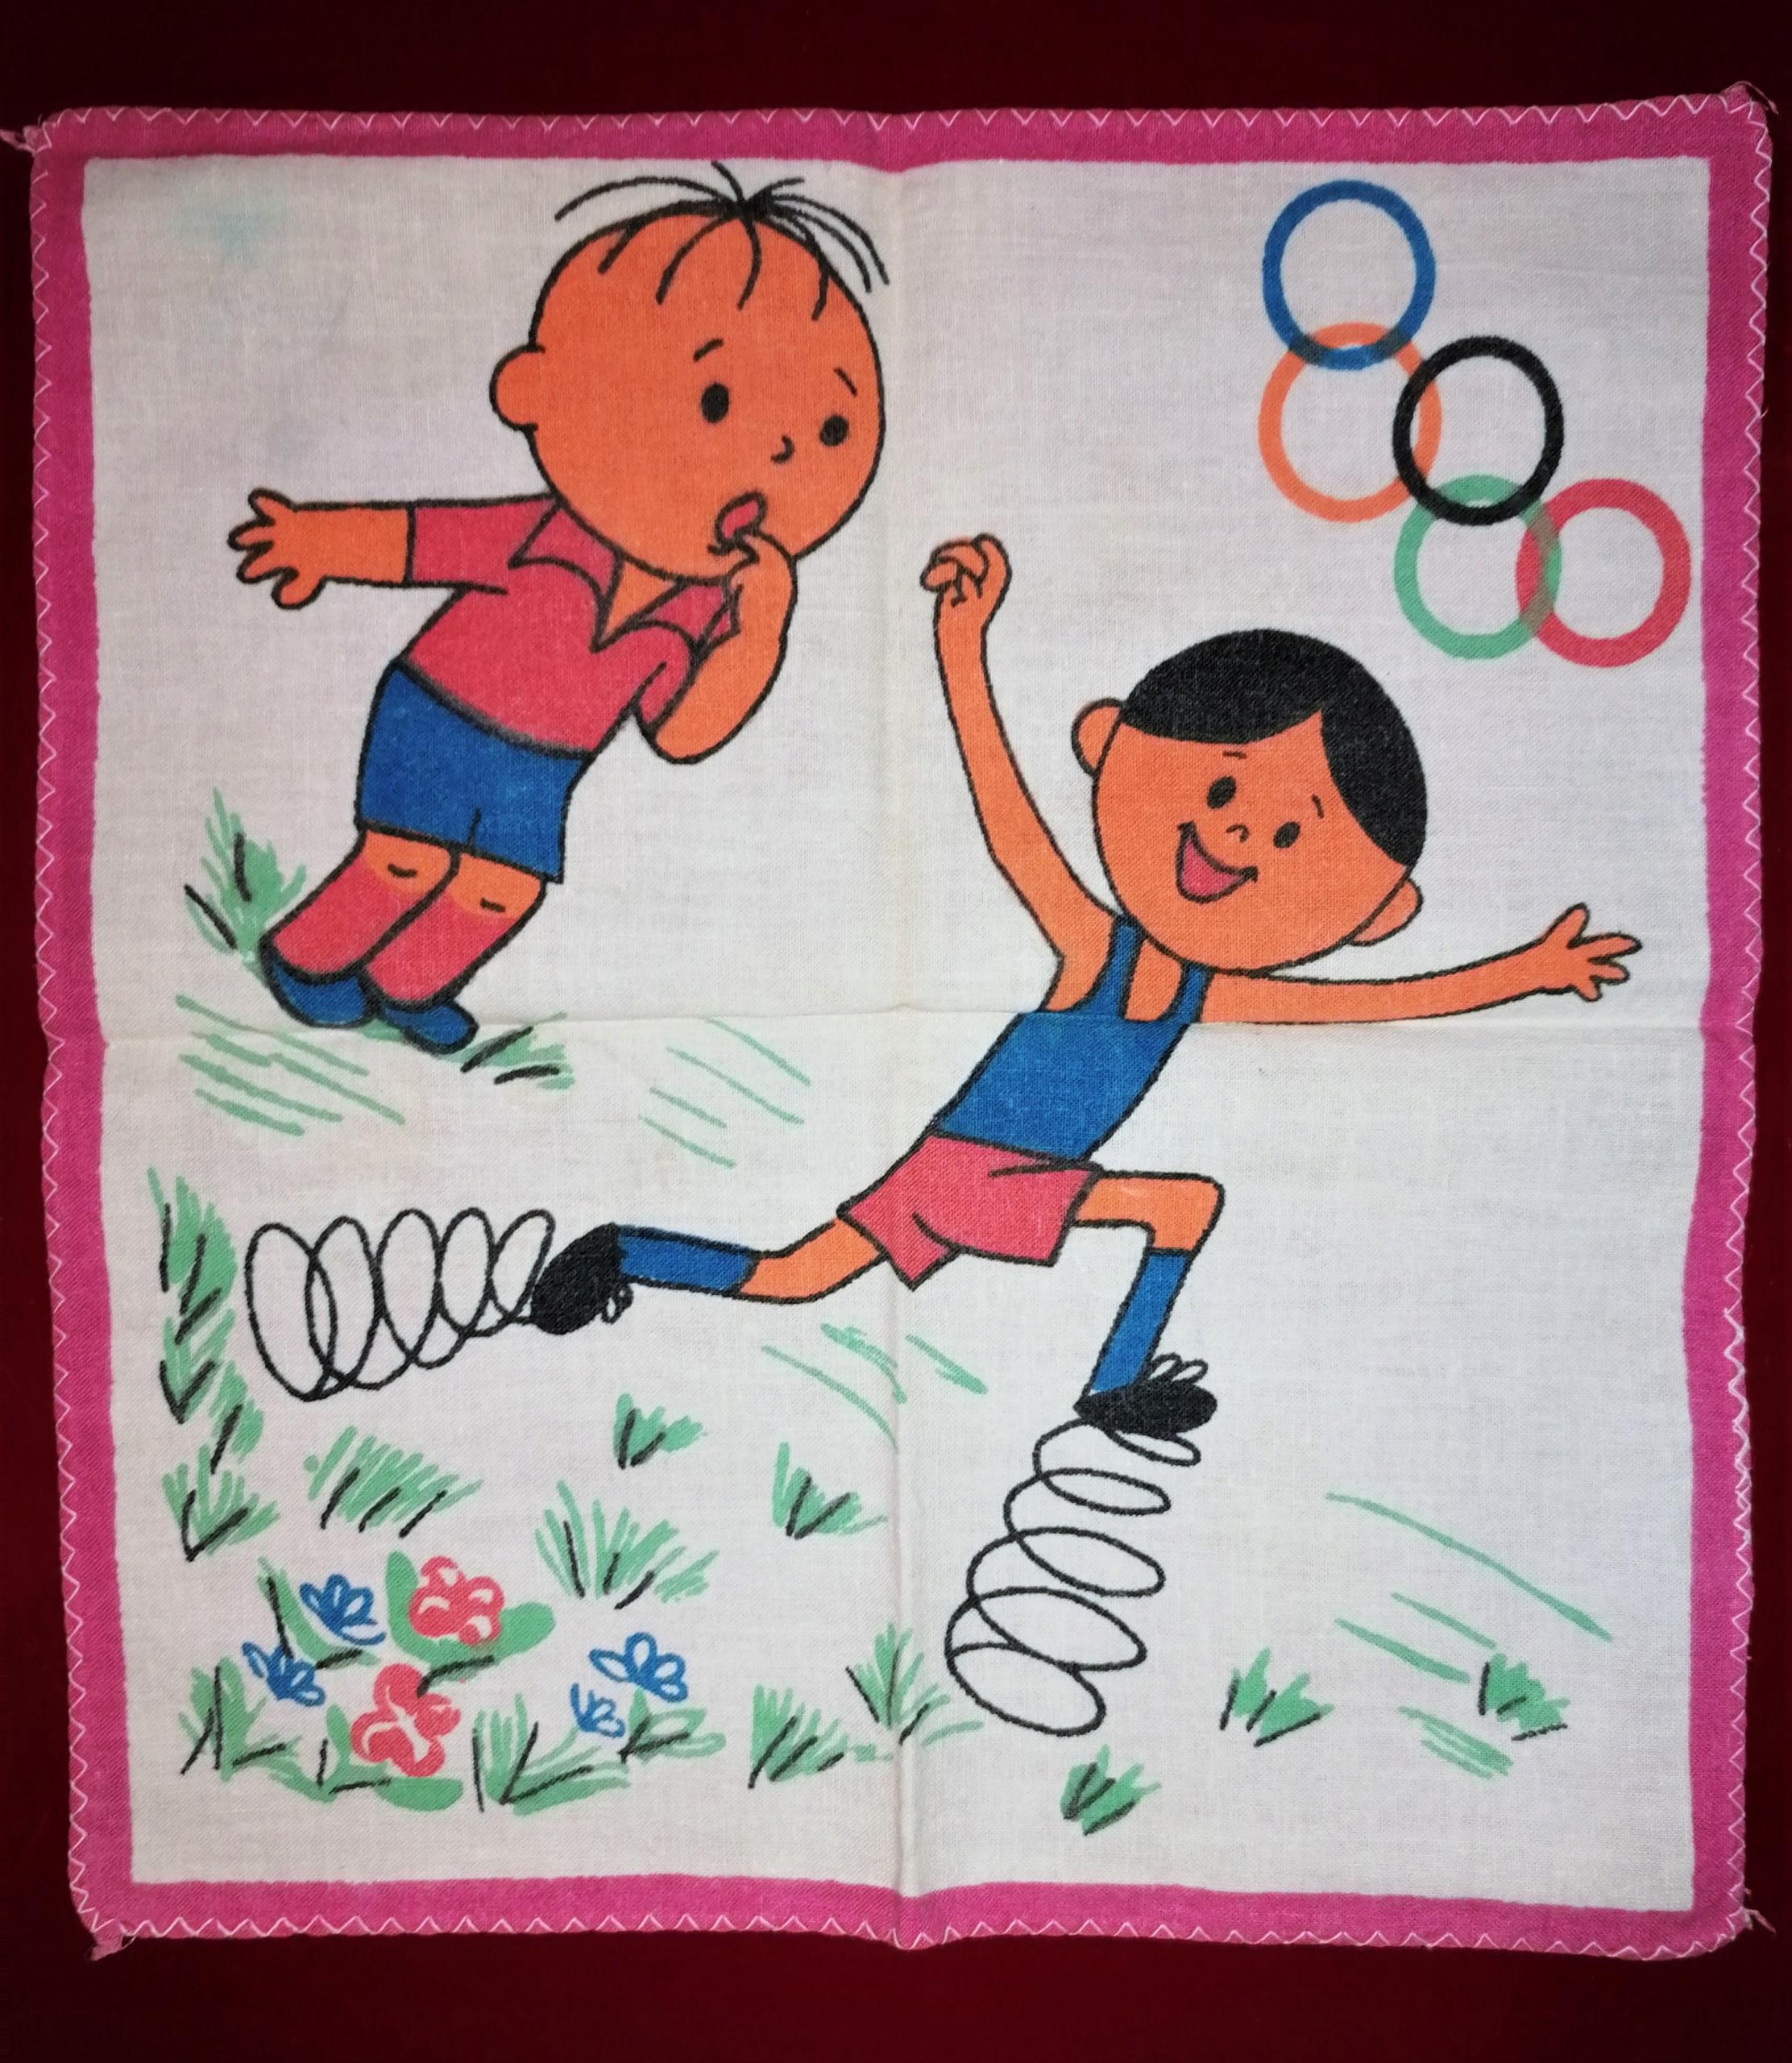 BOLEK i LOLEK Olimpiada chusteczka do nosa PRL 70